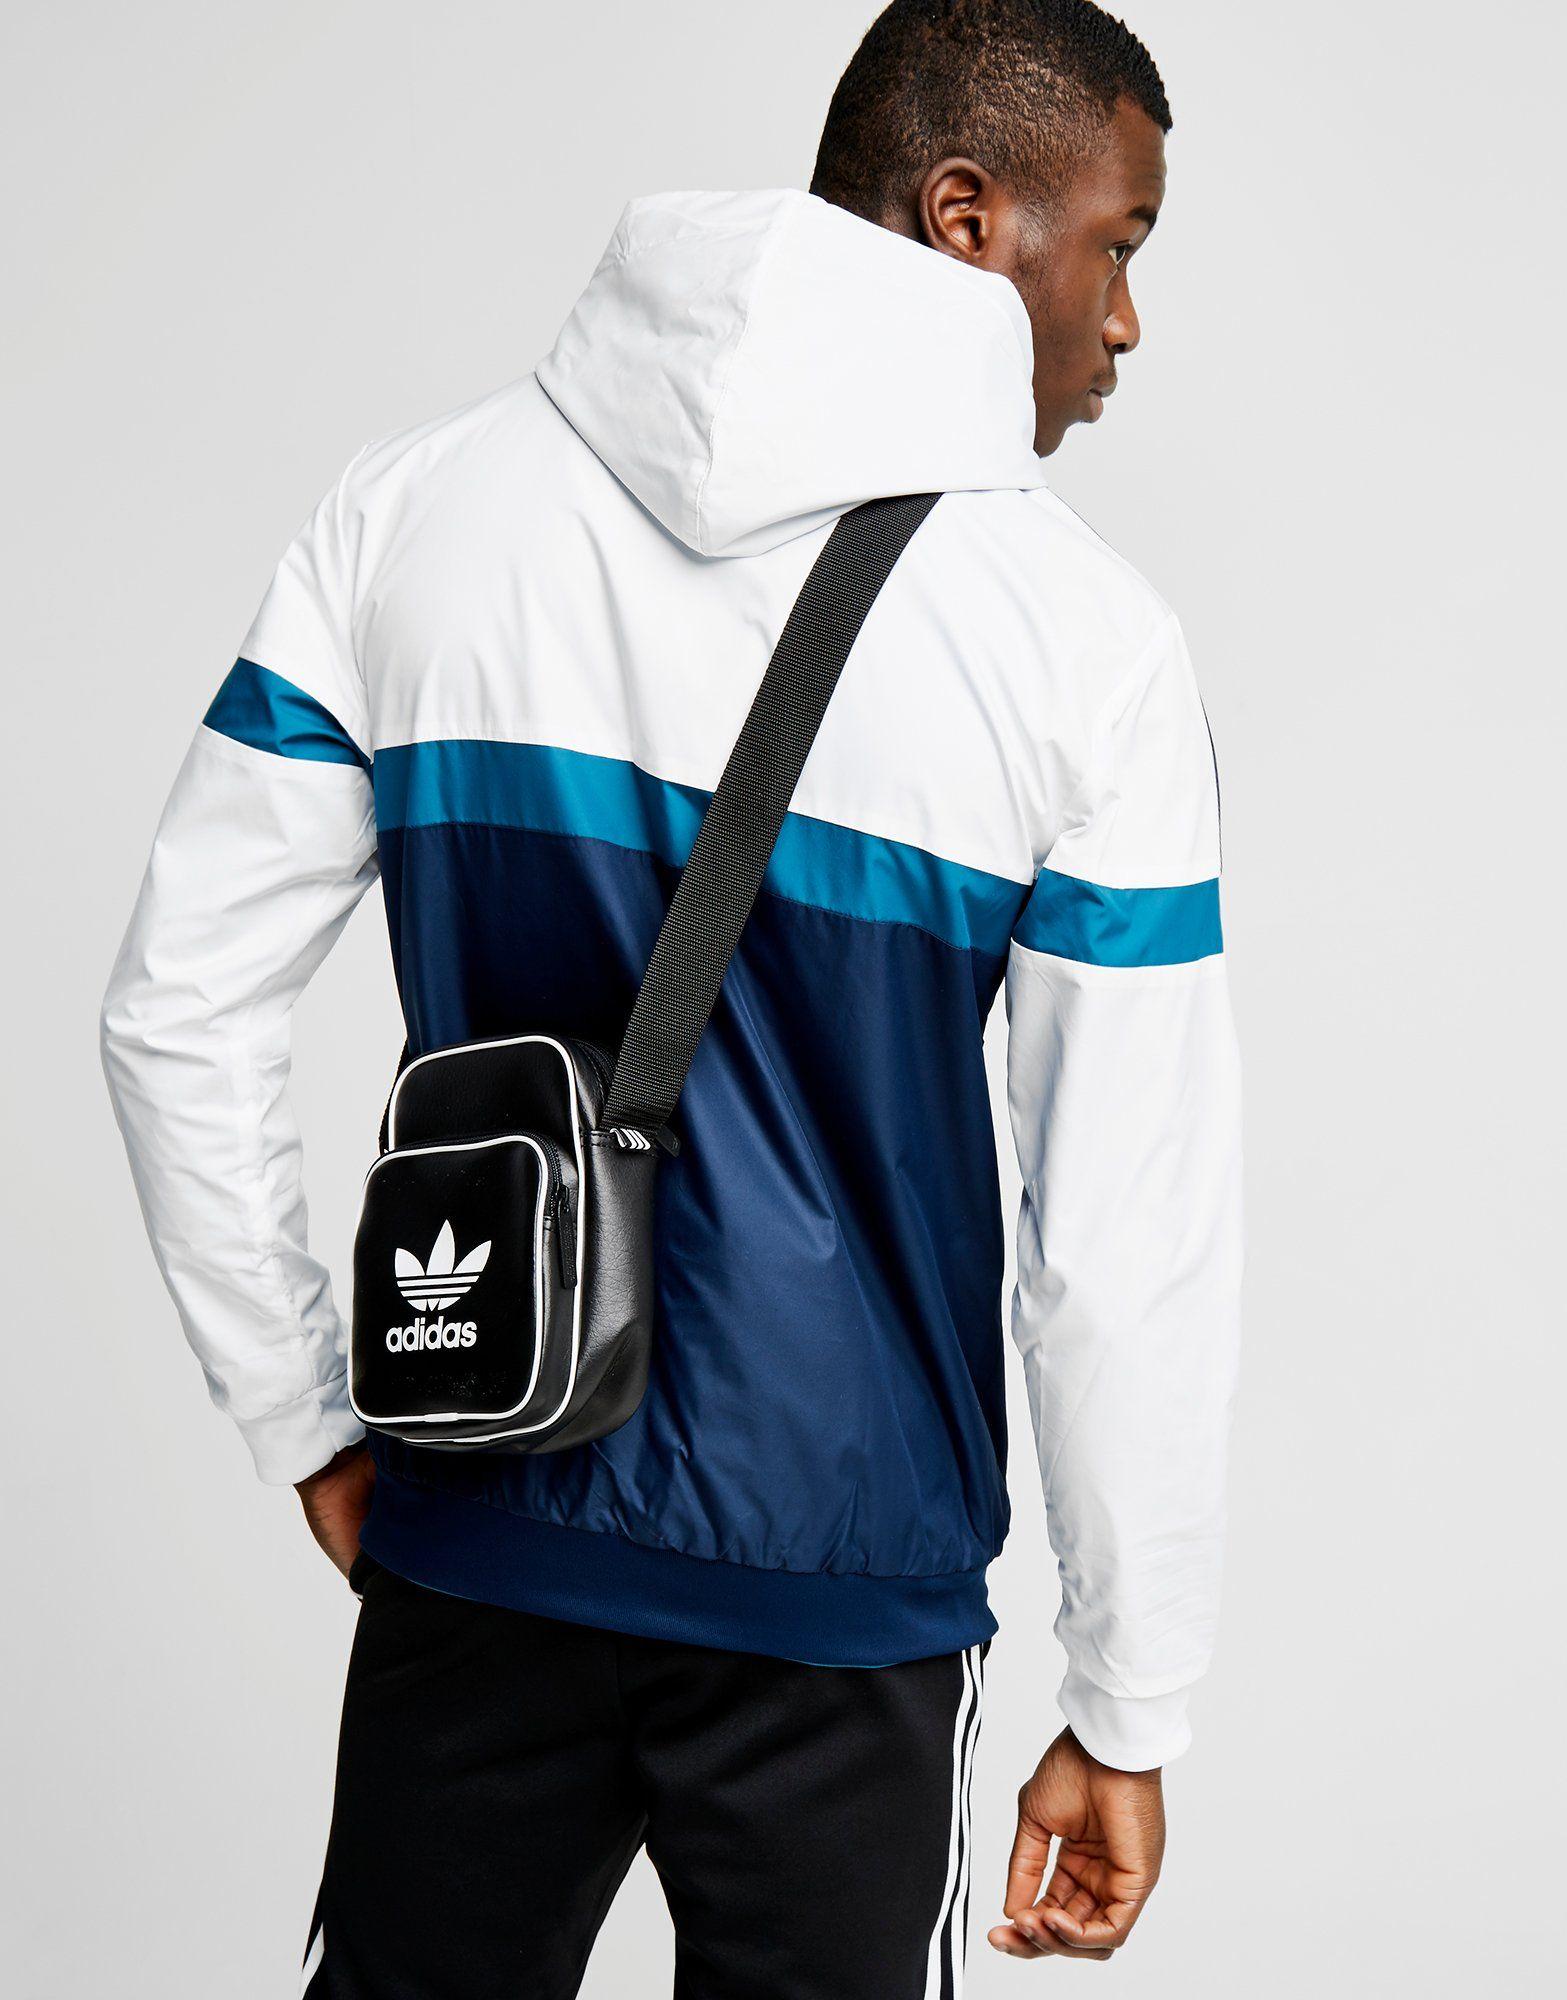 Adidas Originals Itaska chaqueta reversible JD Sports